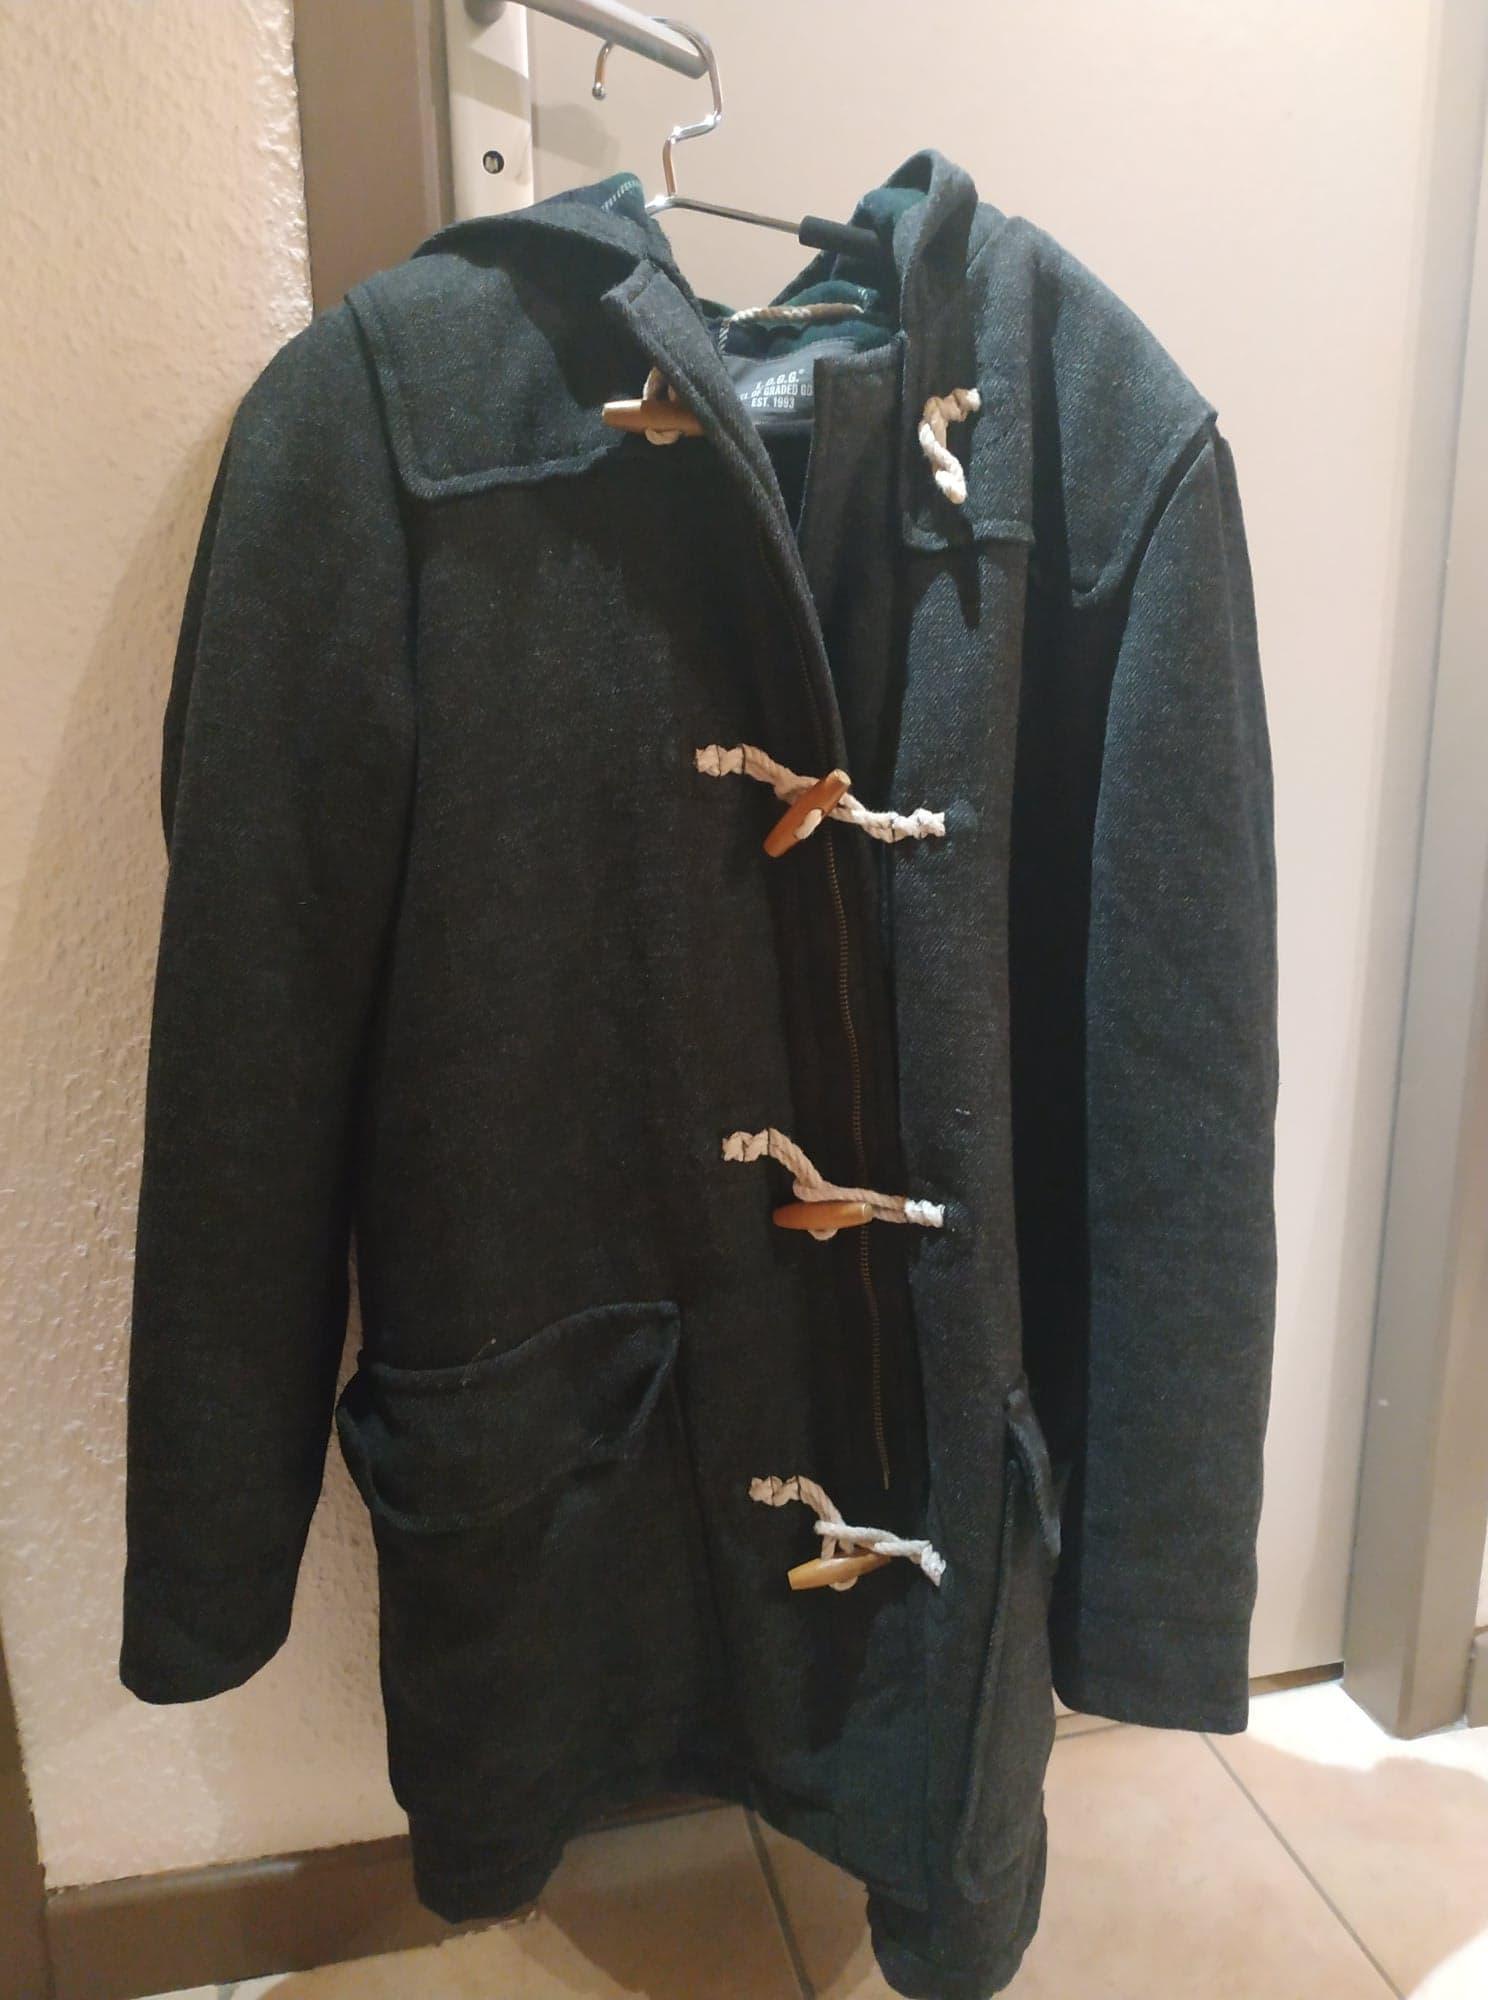 troc de troc duffle coats h&m image 0